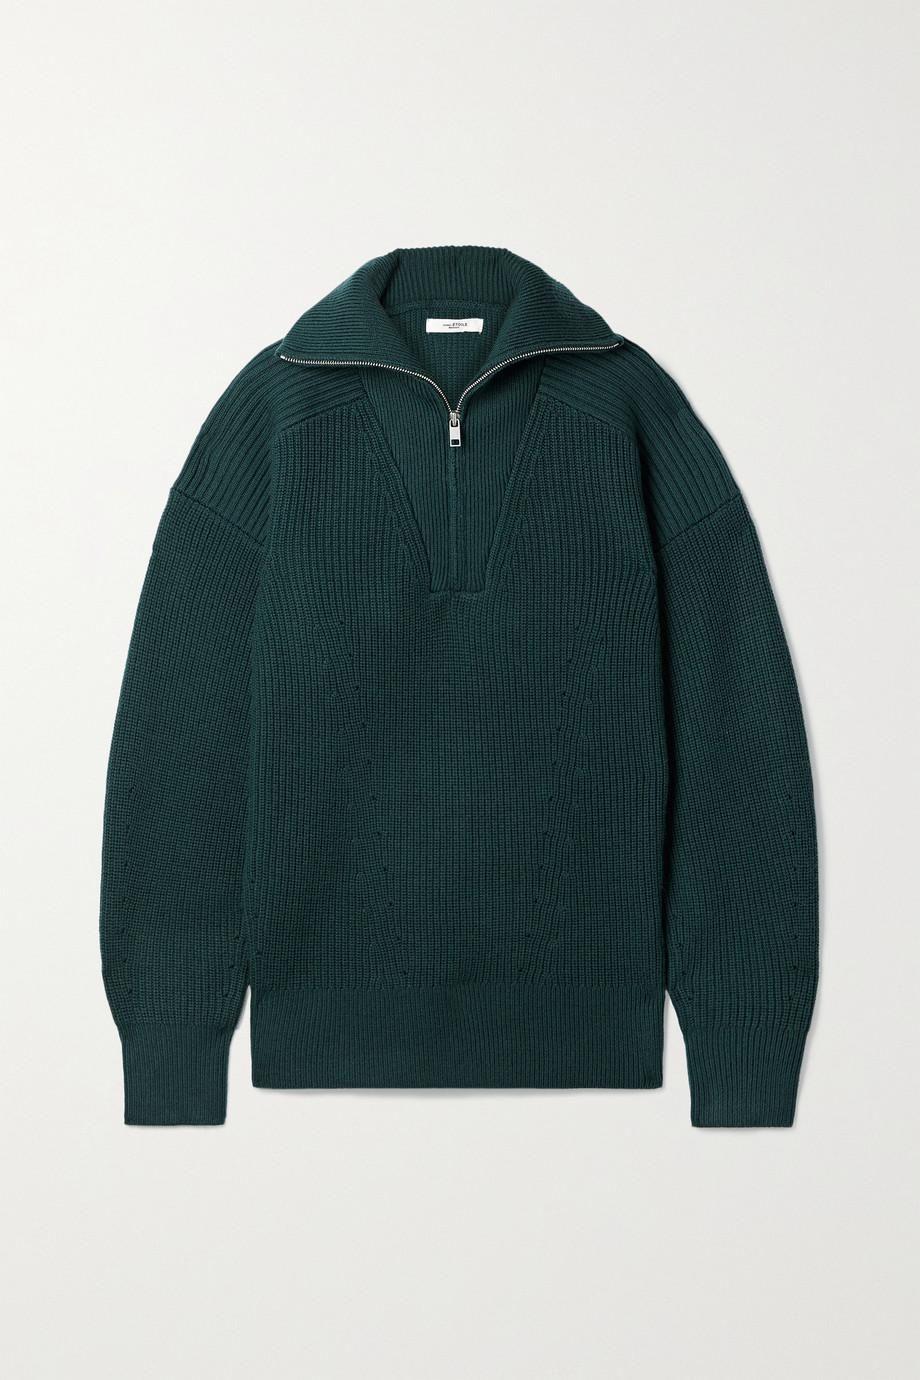 Benny Ribbed Merino Wool Sweater